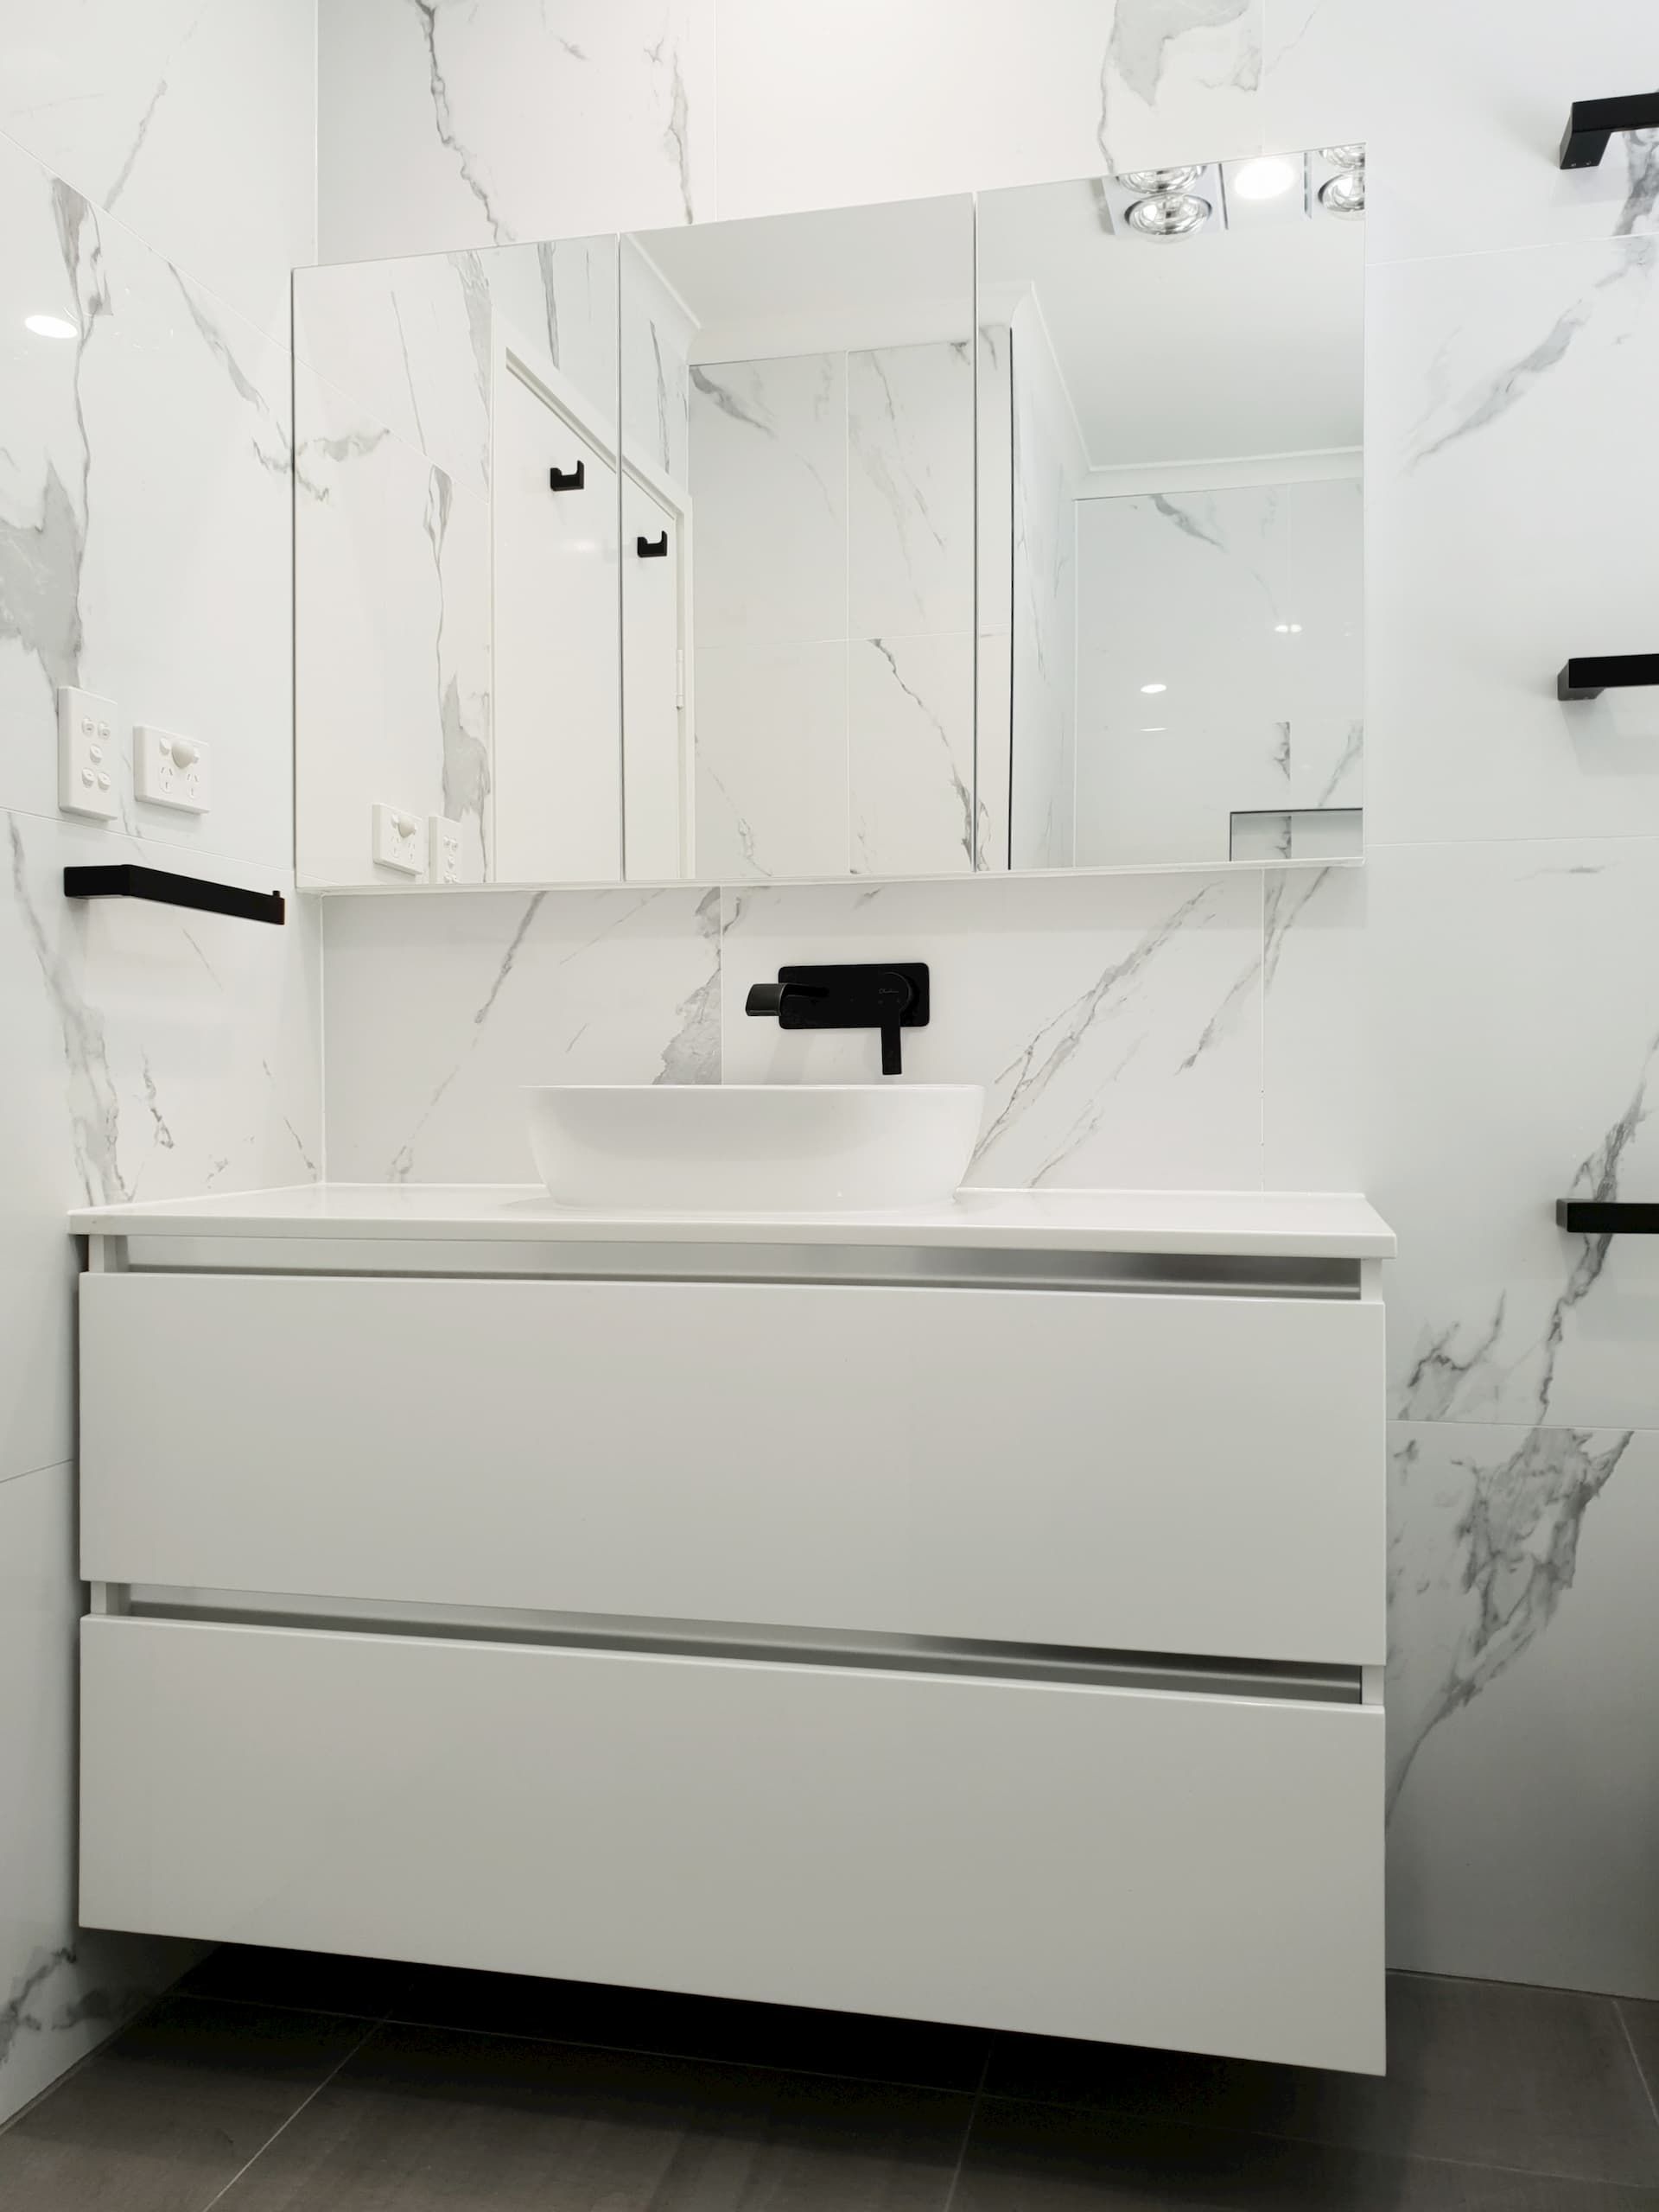 Ashgrove Main Bathroom